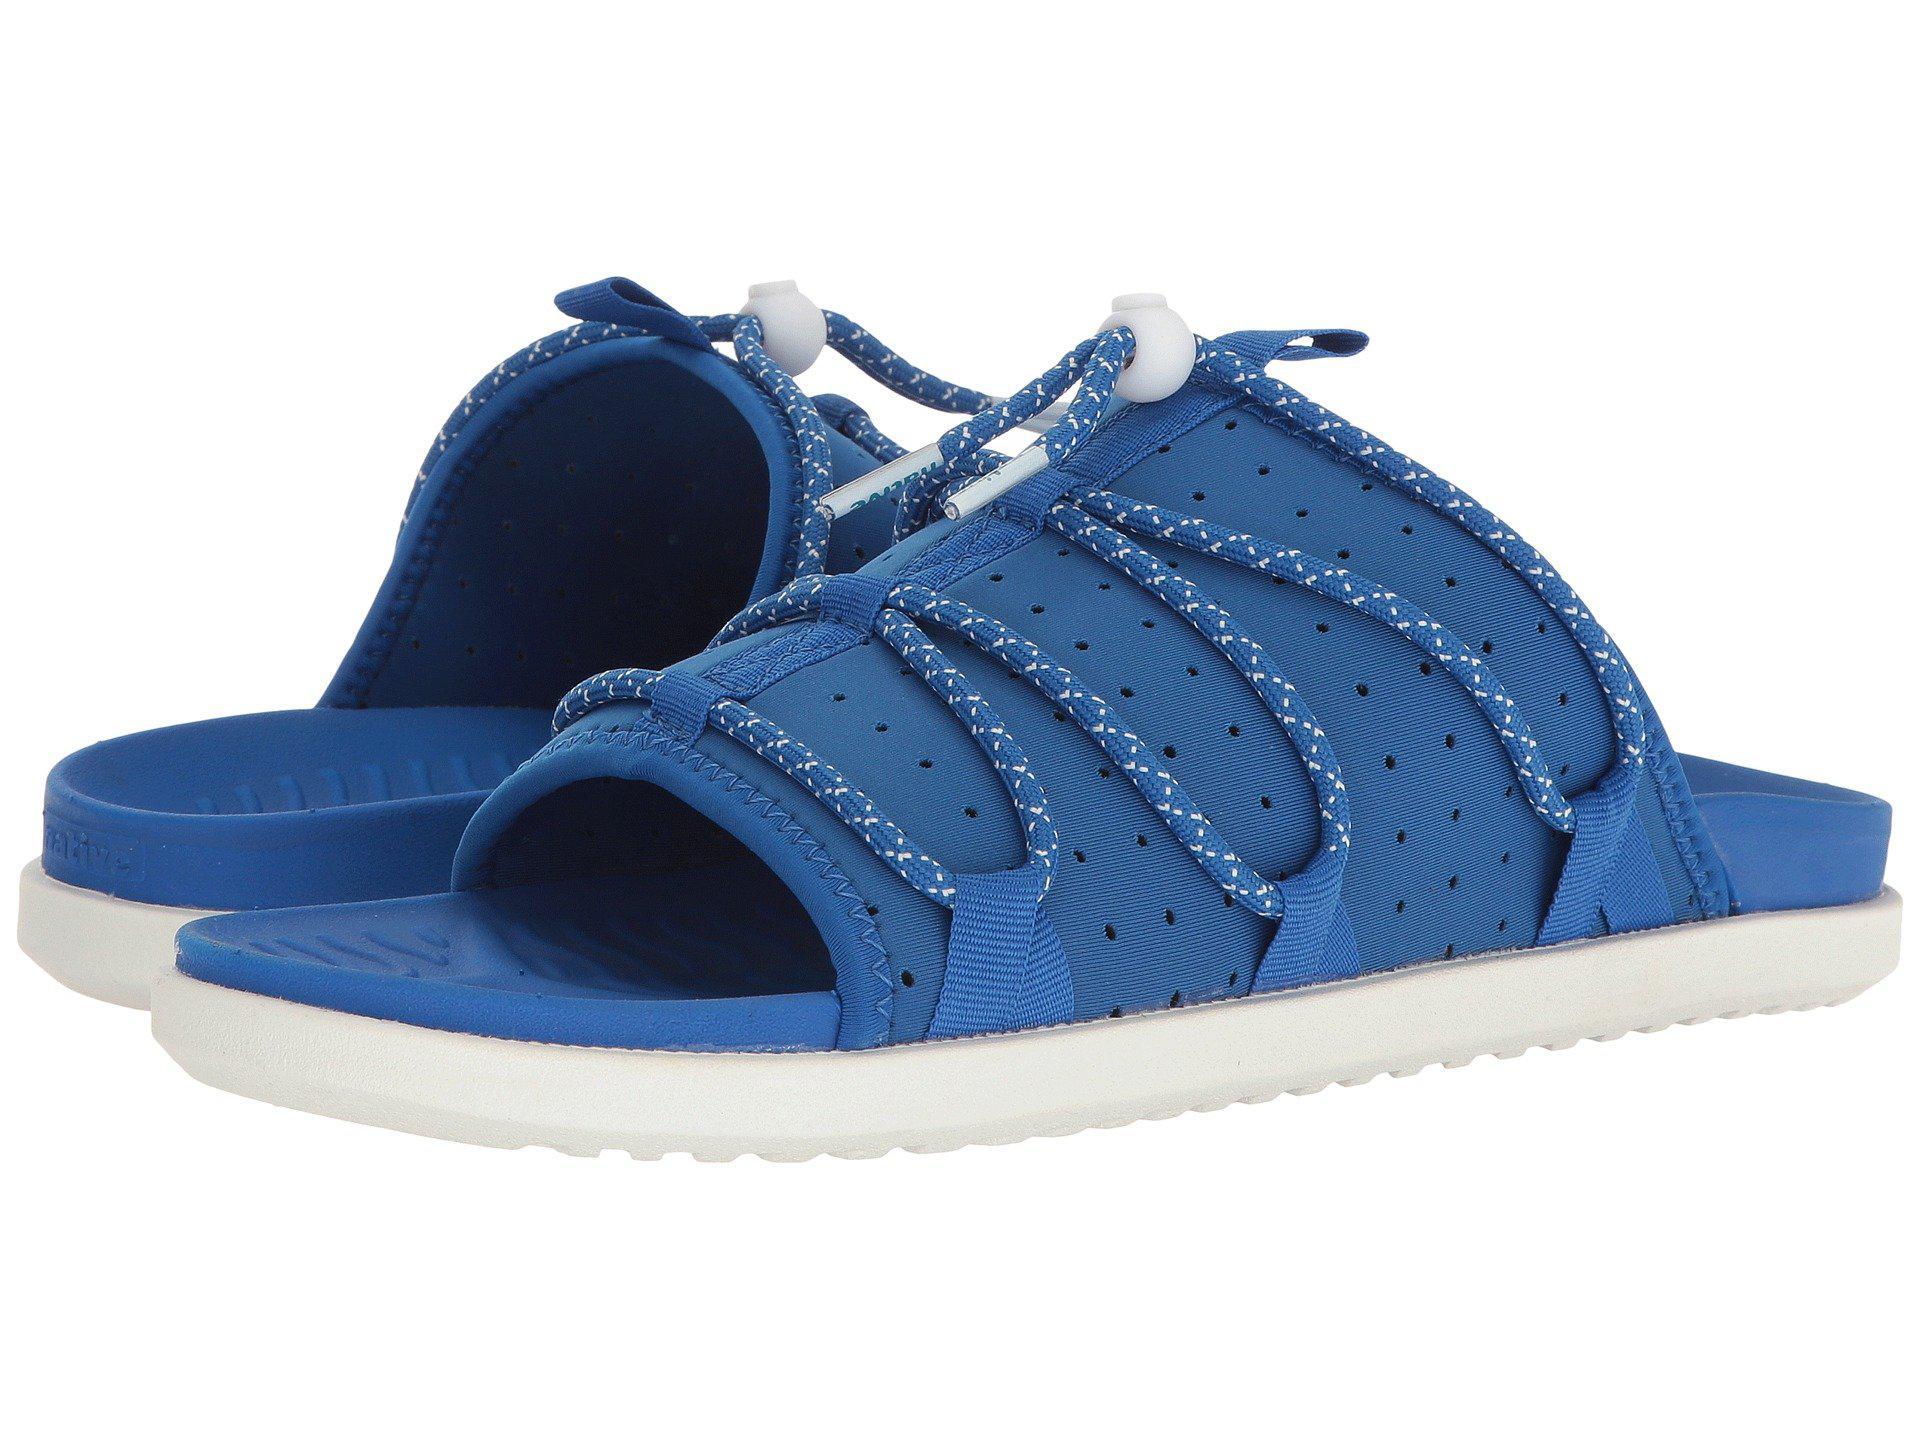 63e4e594750 Lyst - Native Shoes Palmer in Blue